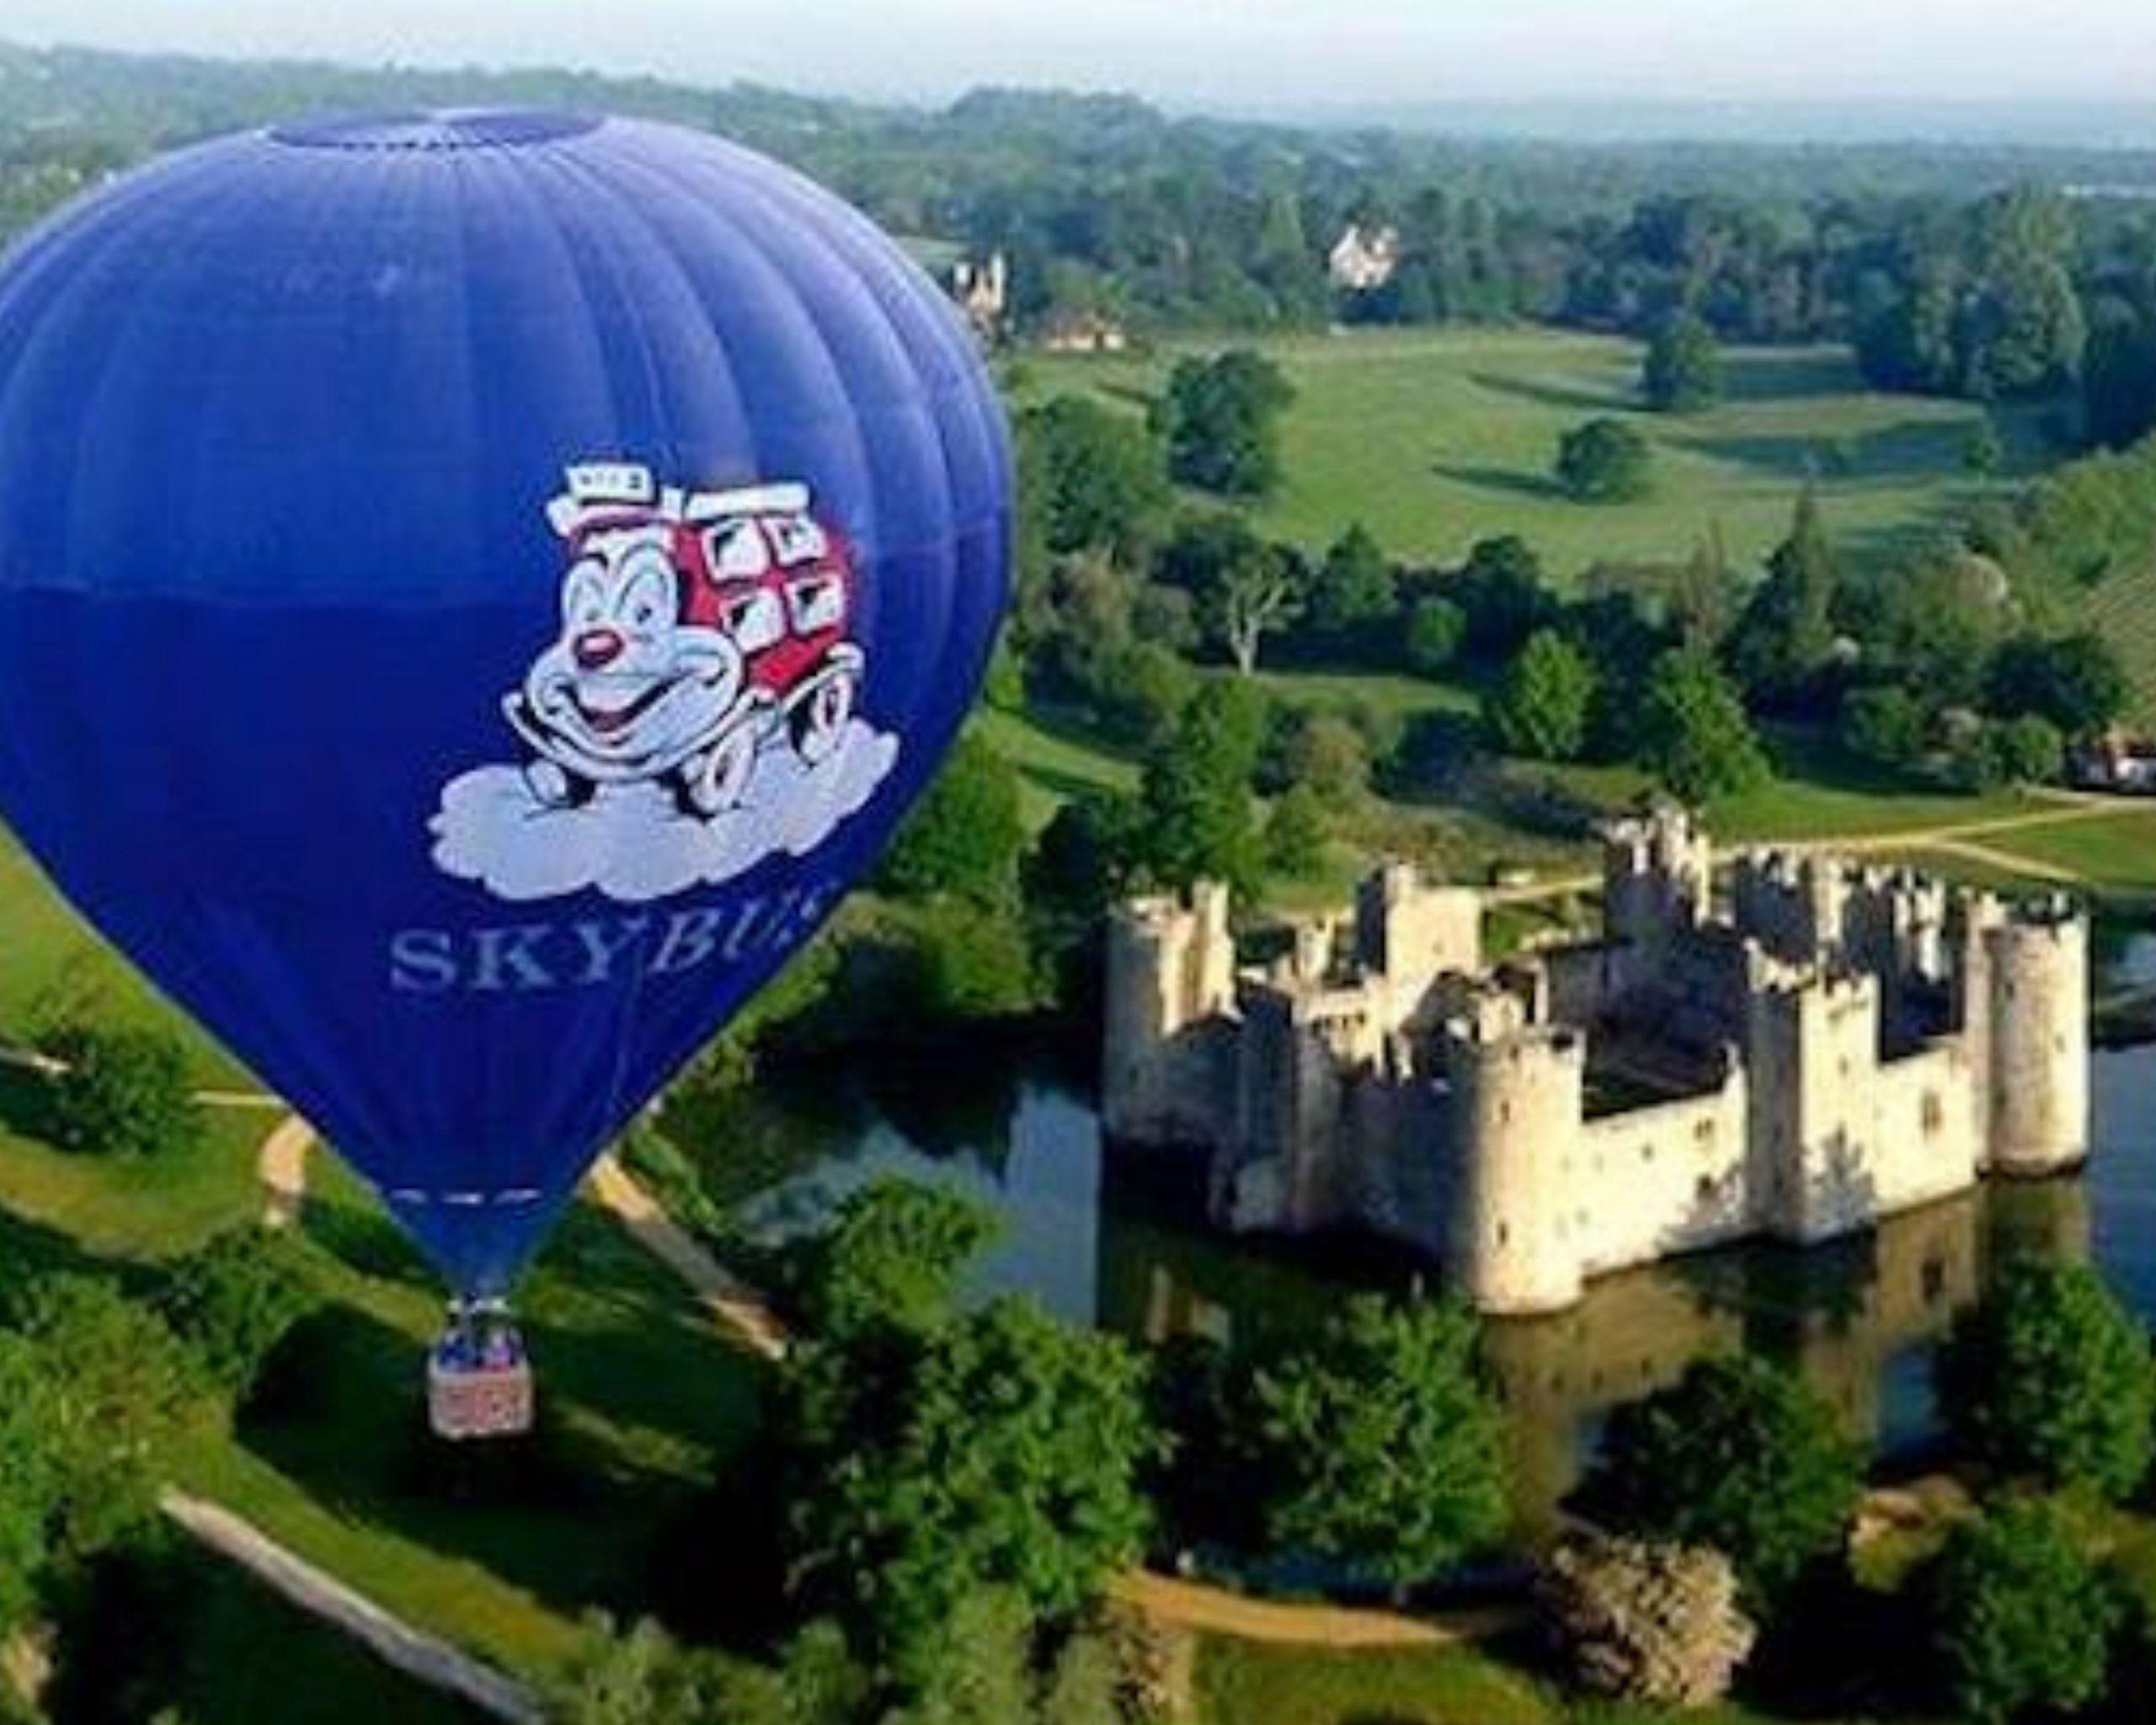 Balloon ride over Bodiam castle